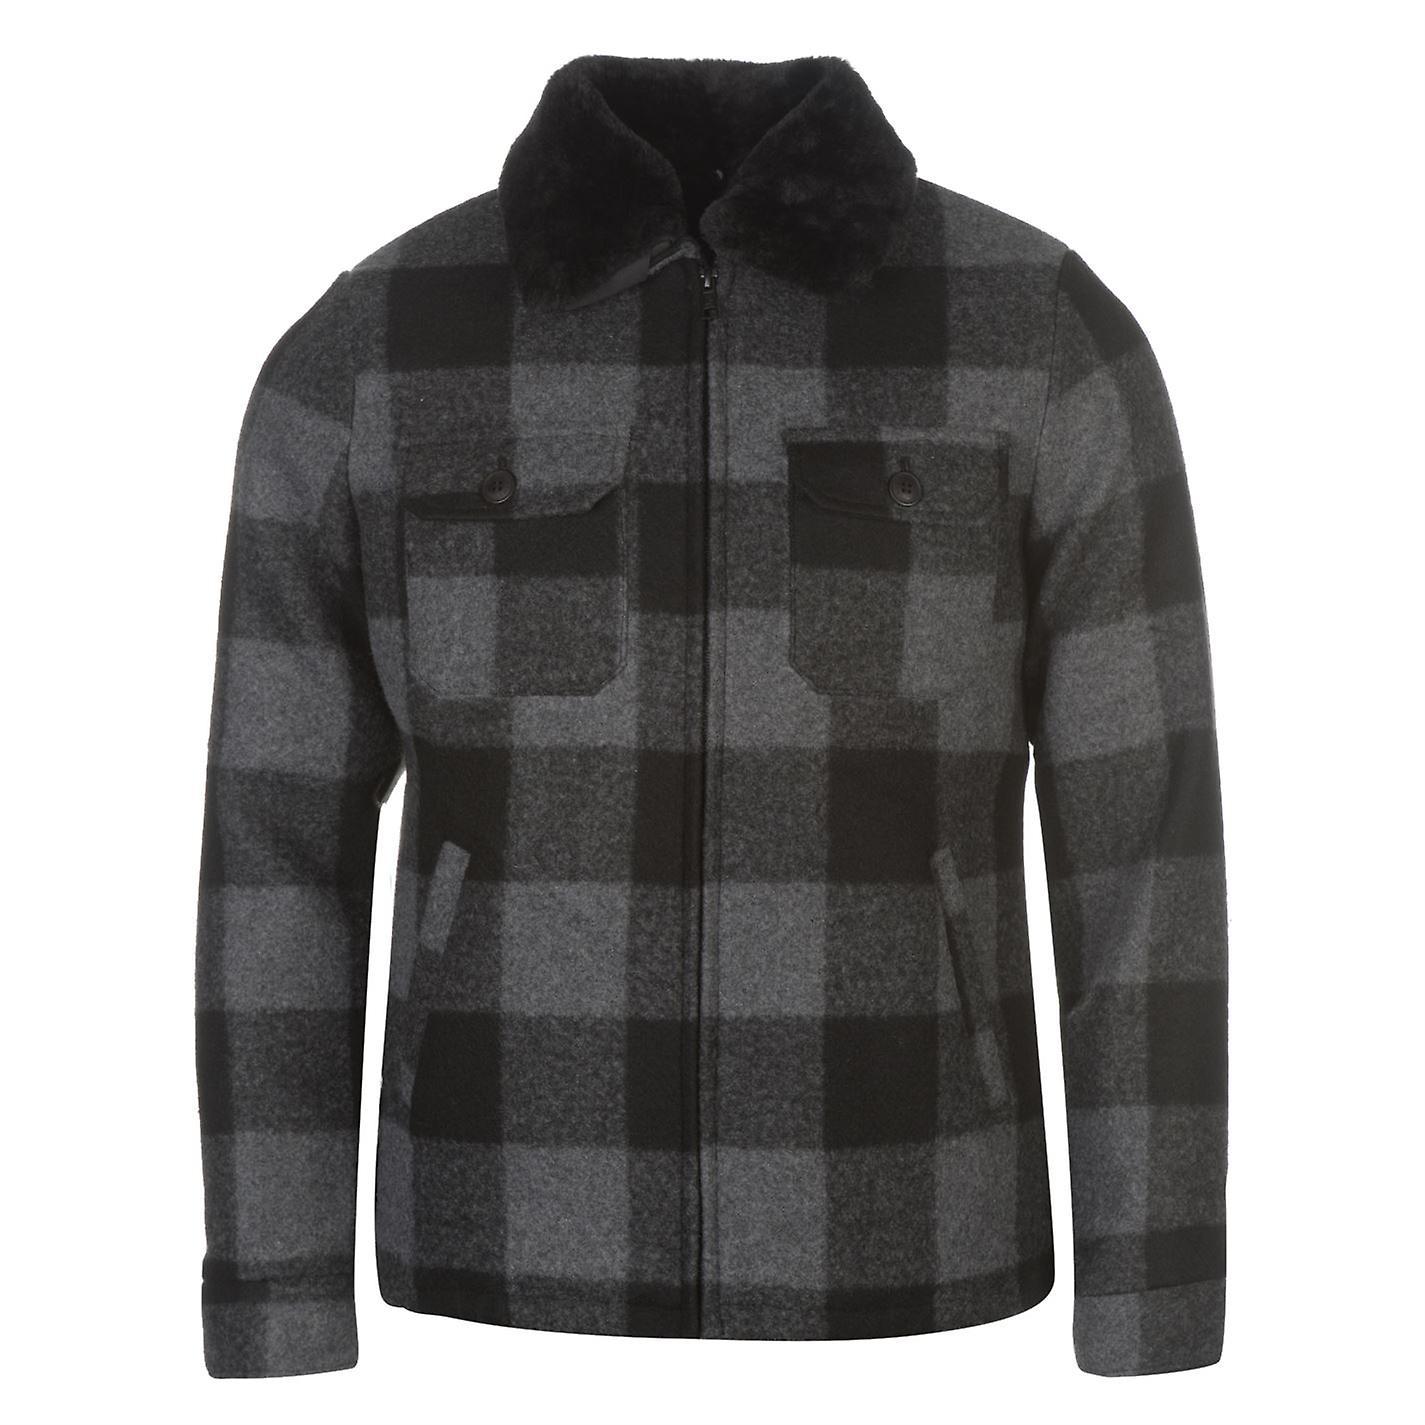 Pierre Cardin Mens Checked Jacket Peacoat Coat Top Long Sleeve Zip Full Chest